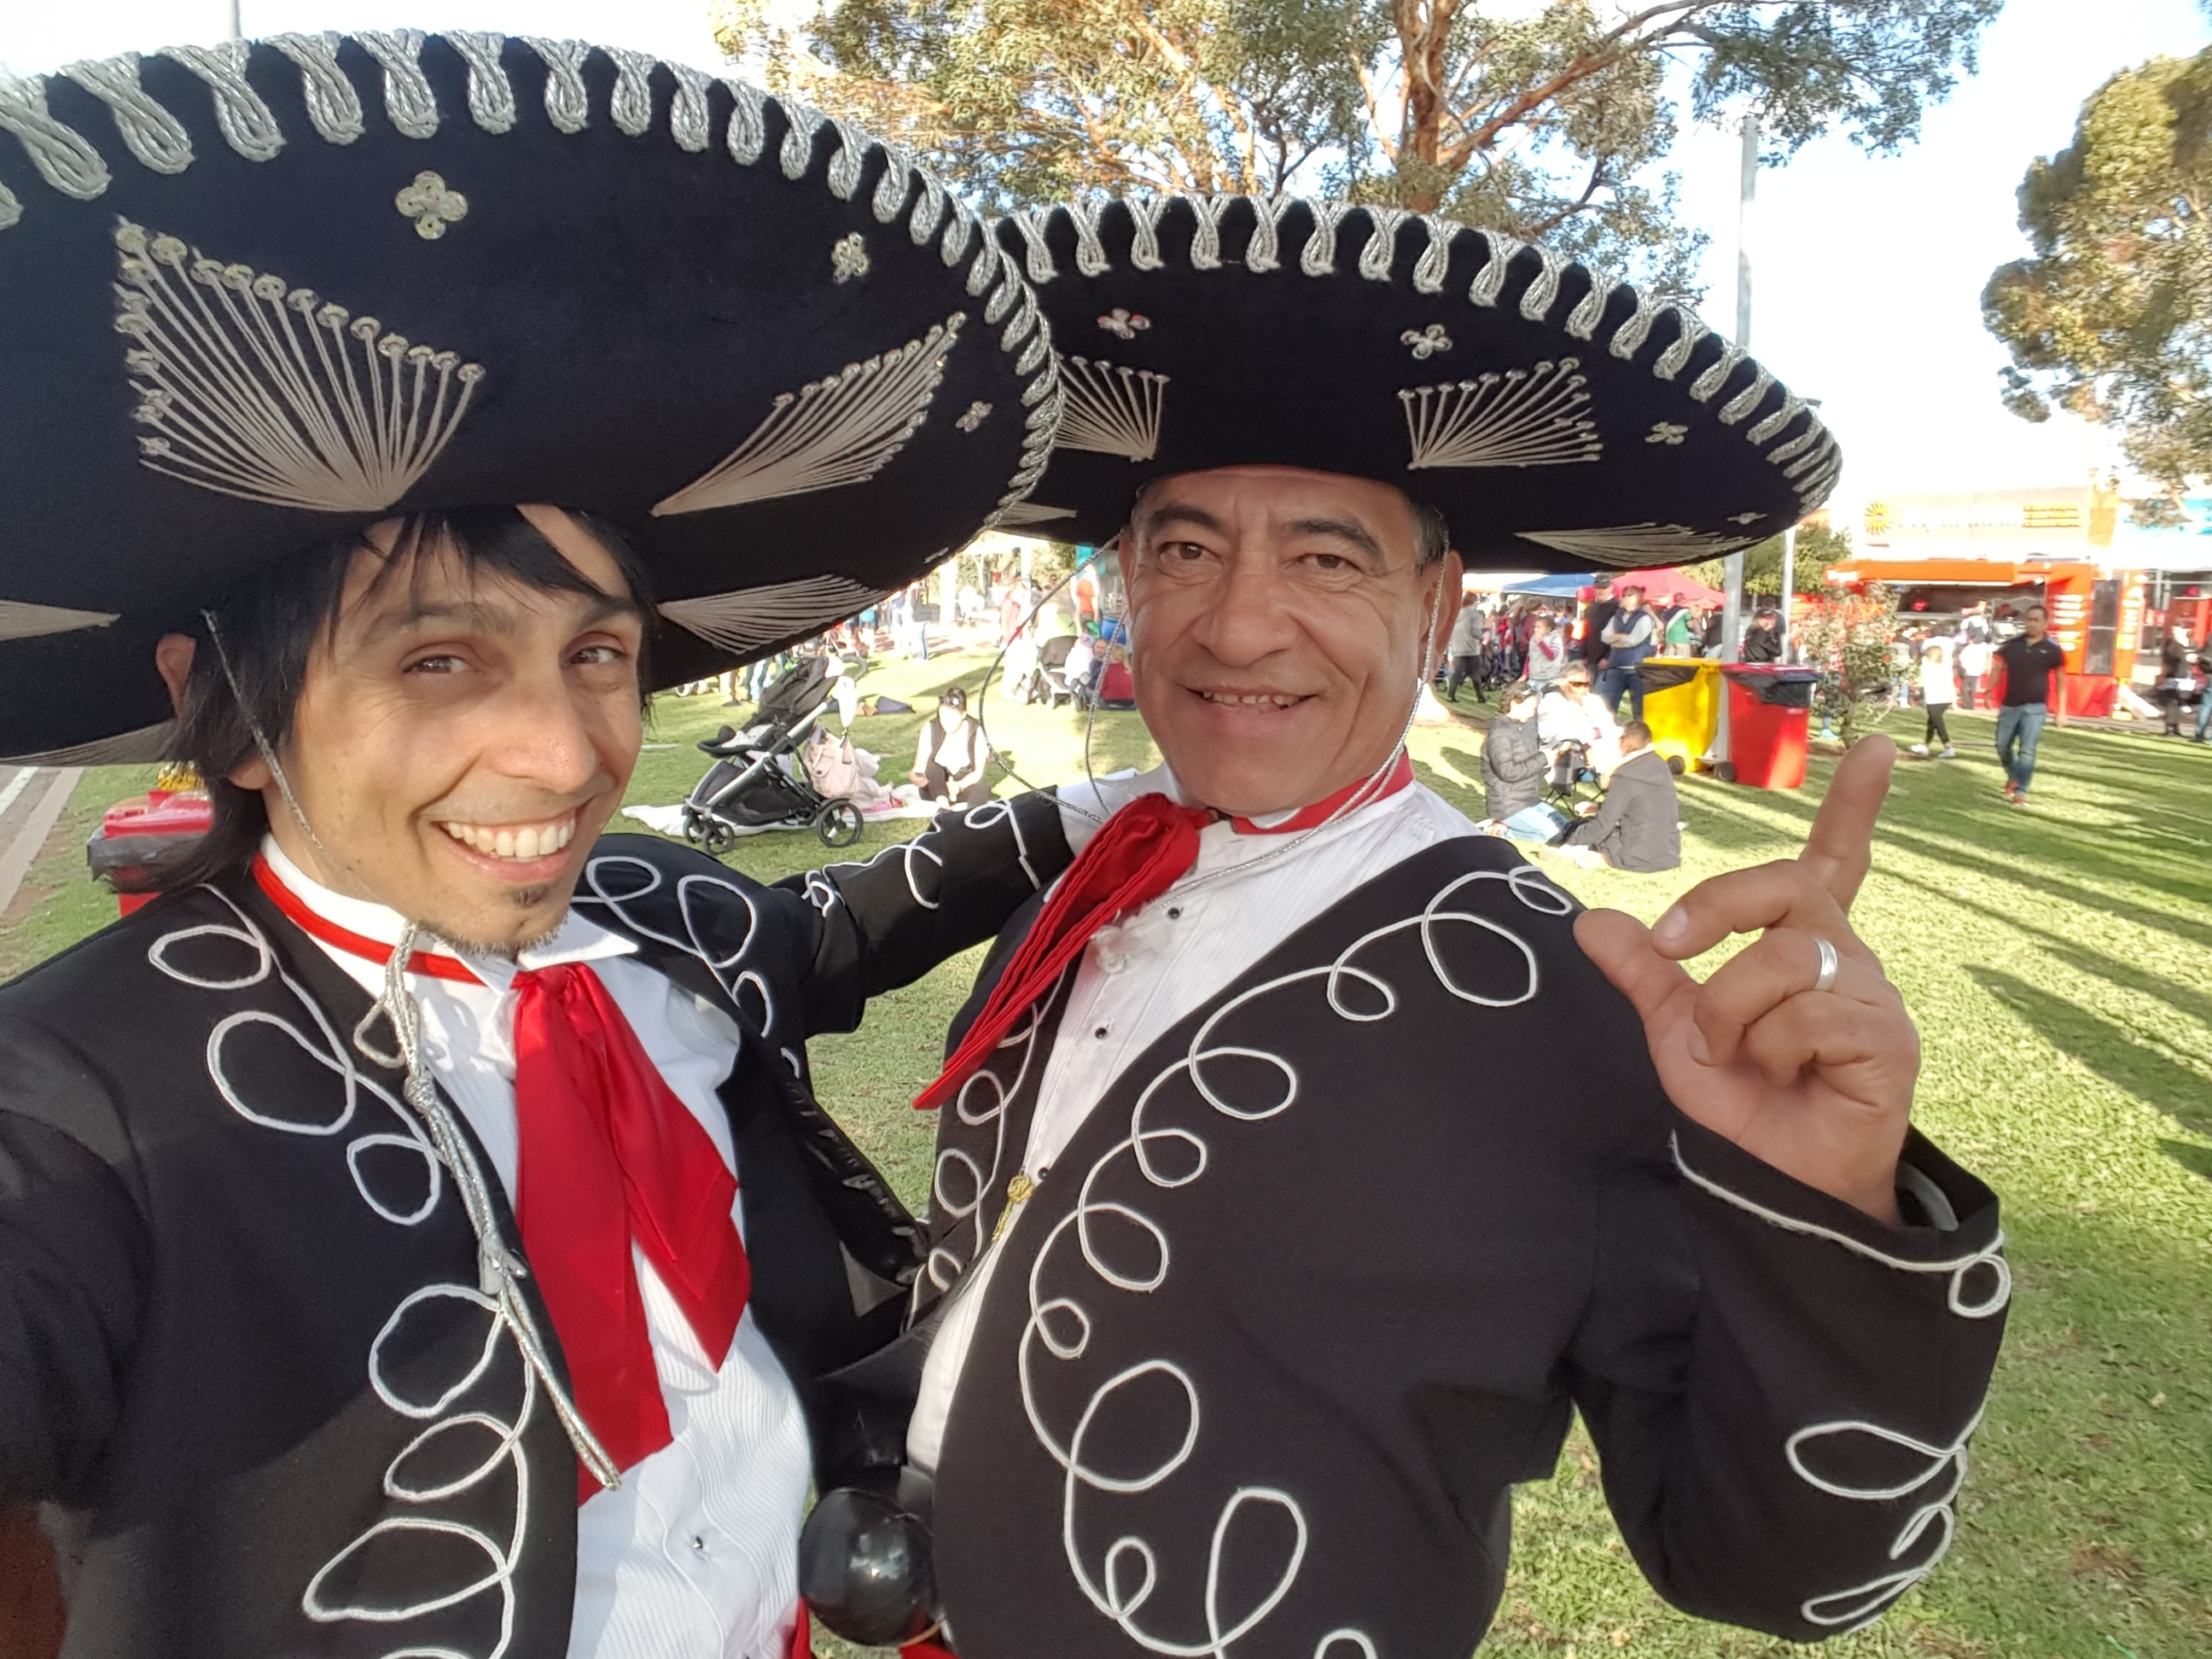 Roxby Downs Festival Multicultural Festival Mexican Mariachi Band Australia Adelaide, Melbourne, Sydney, Brisbane, Darwin, Perth, Tasmania, Singapore, Hong Kong, Dubai